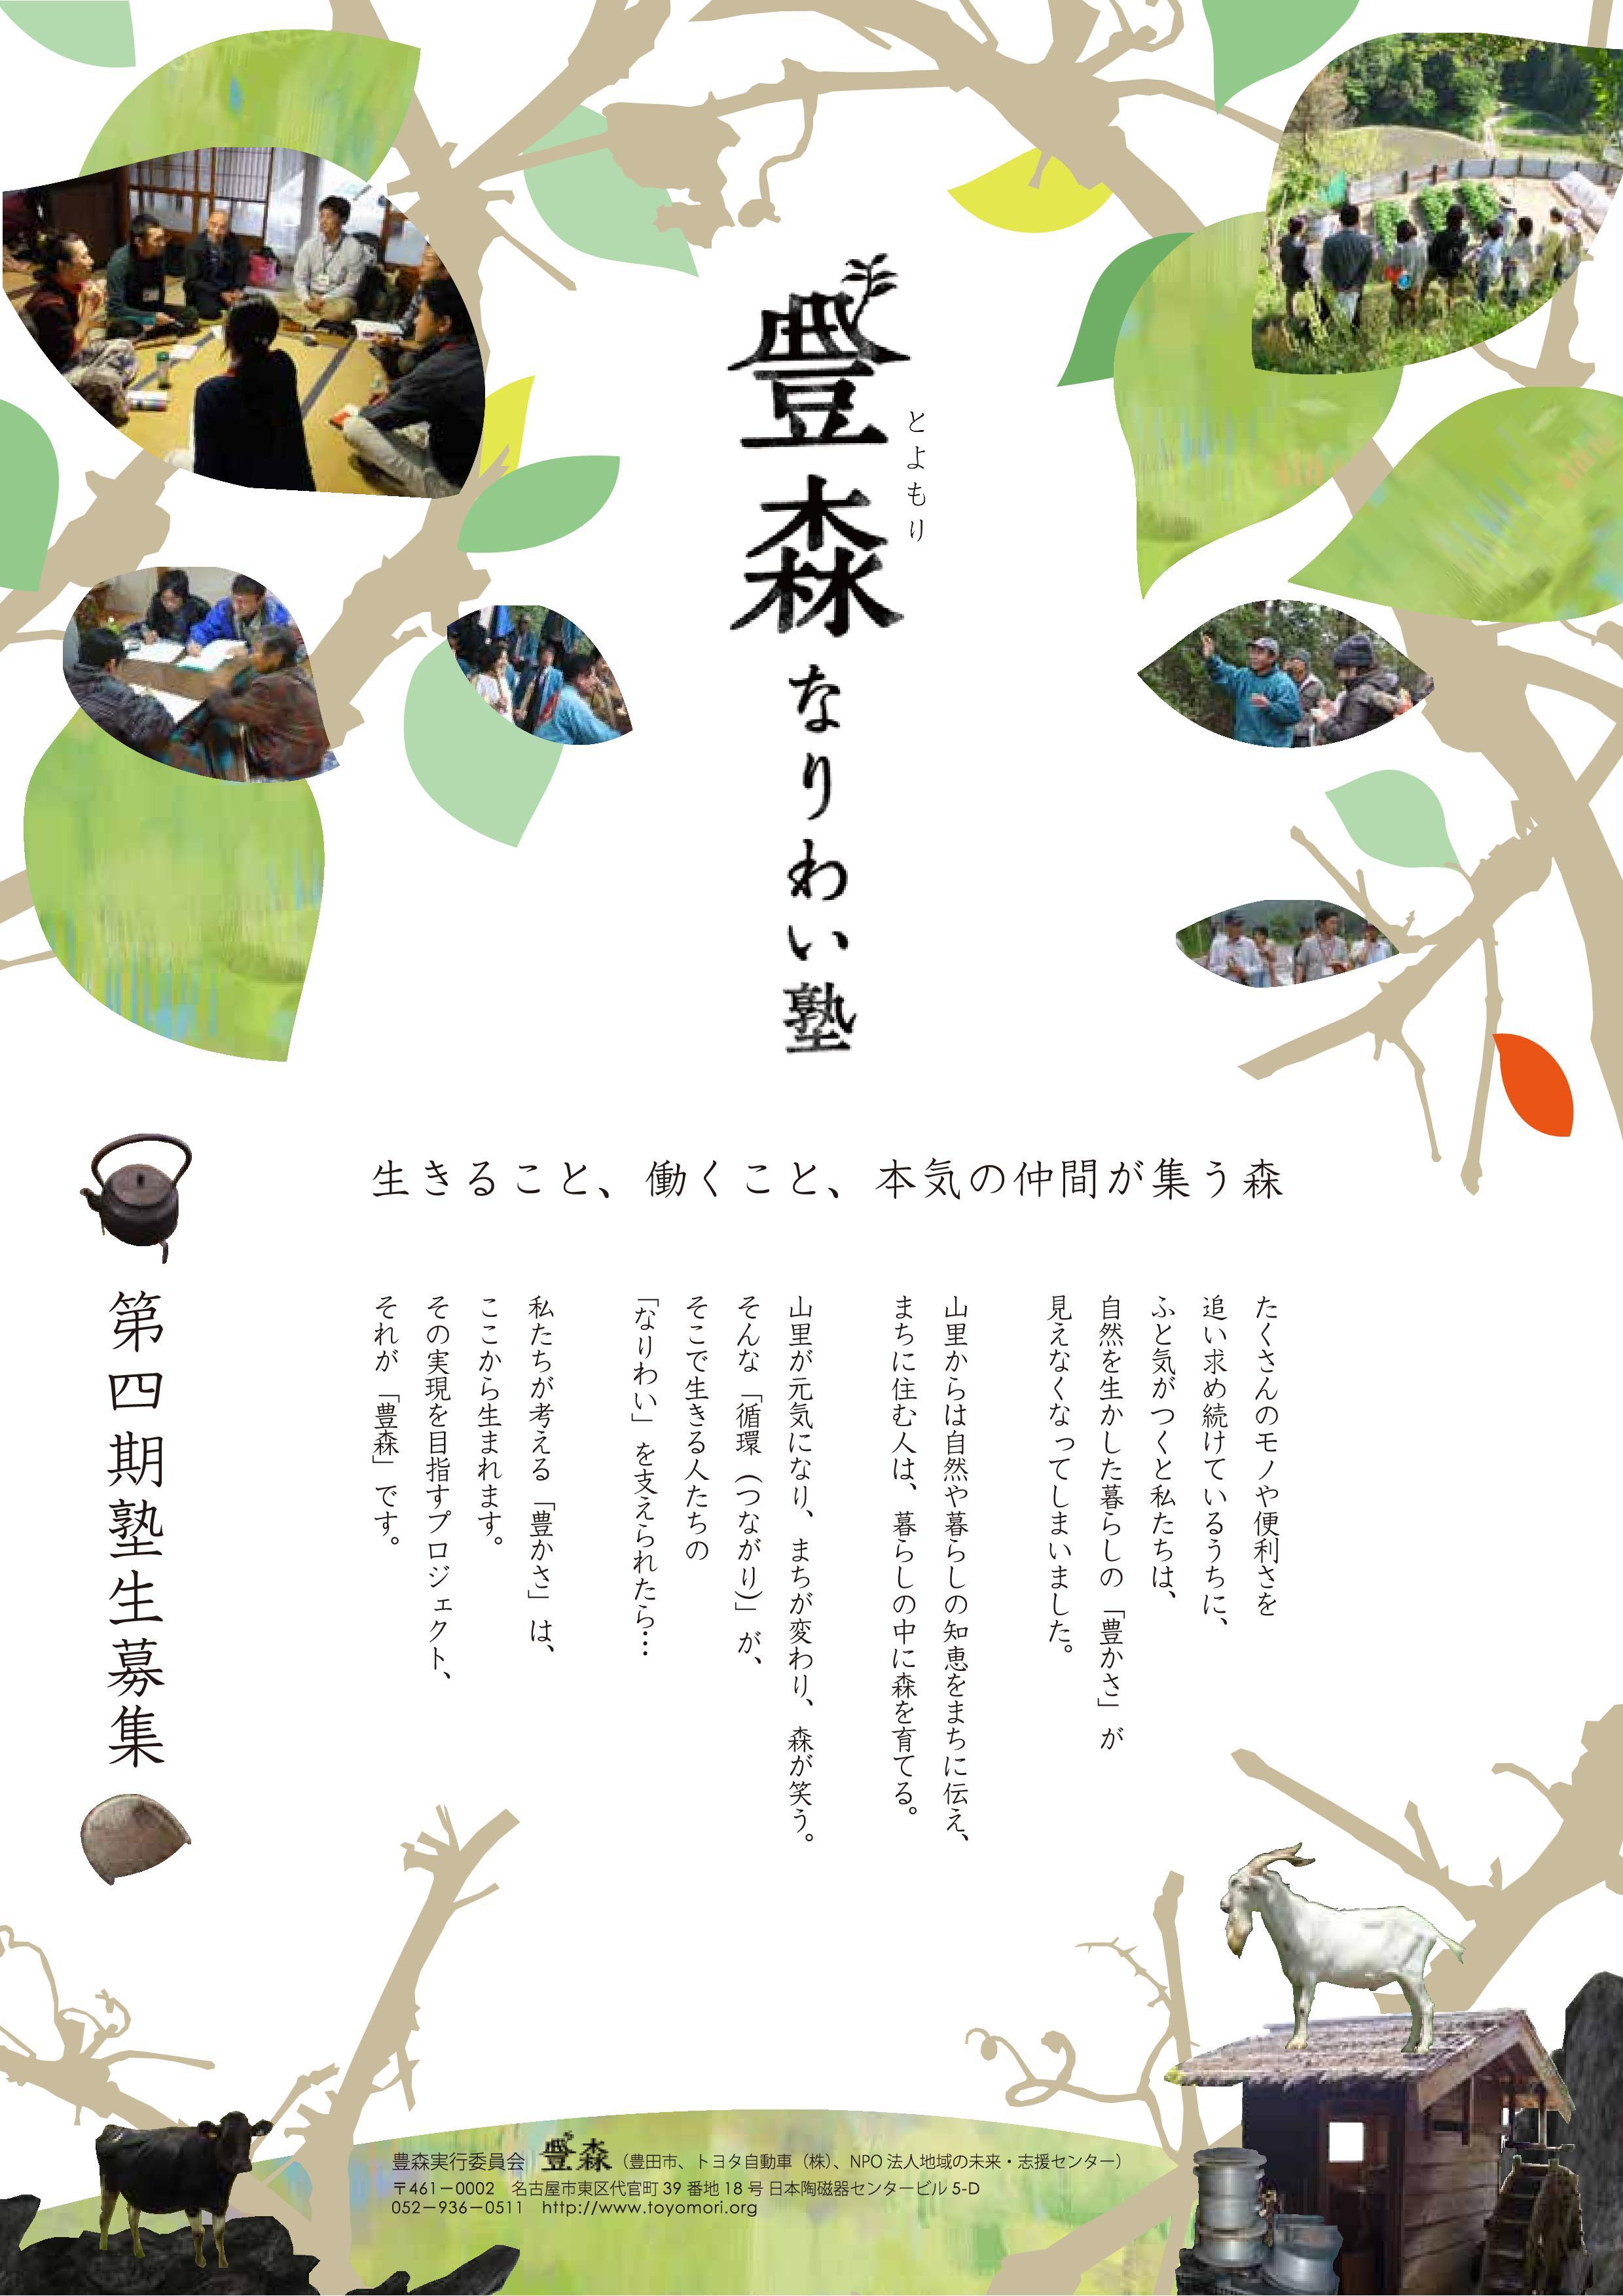 www.toyomori.org_staffbl...014_03_13_toyomori4-001